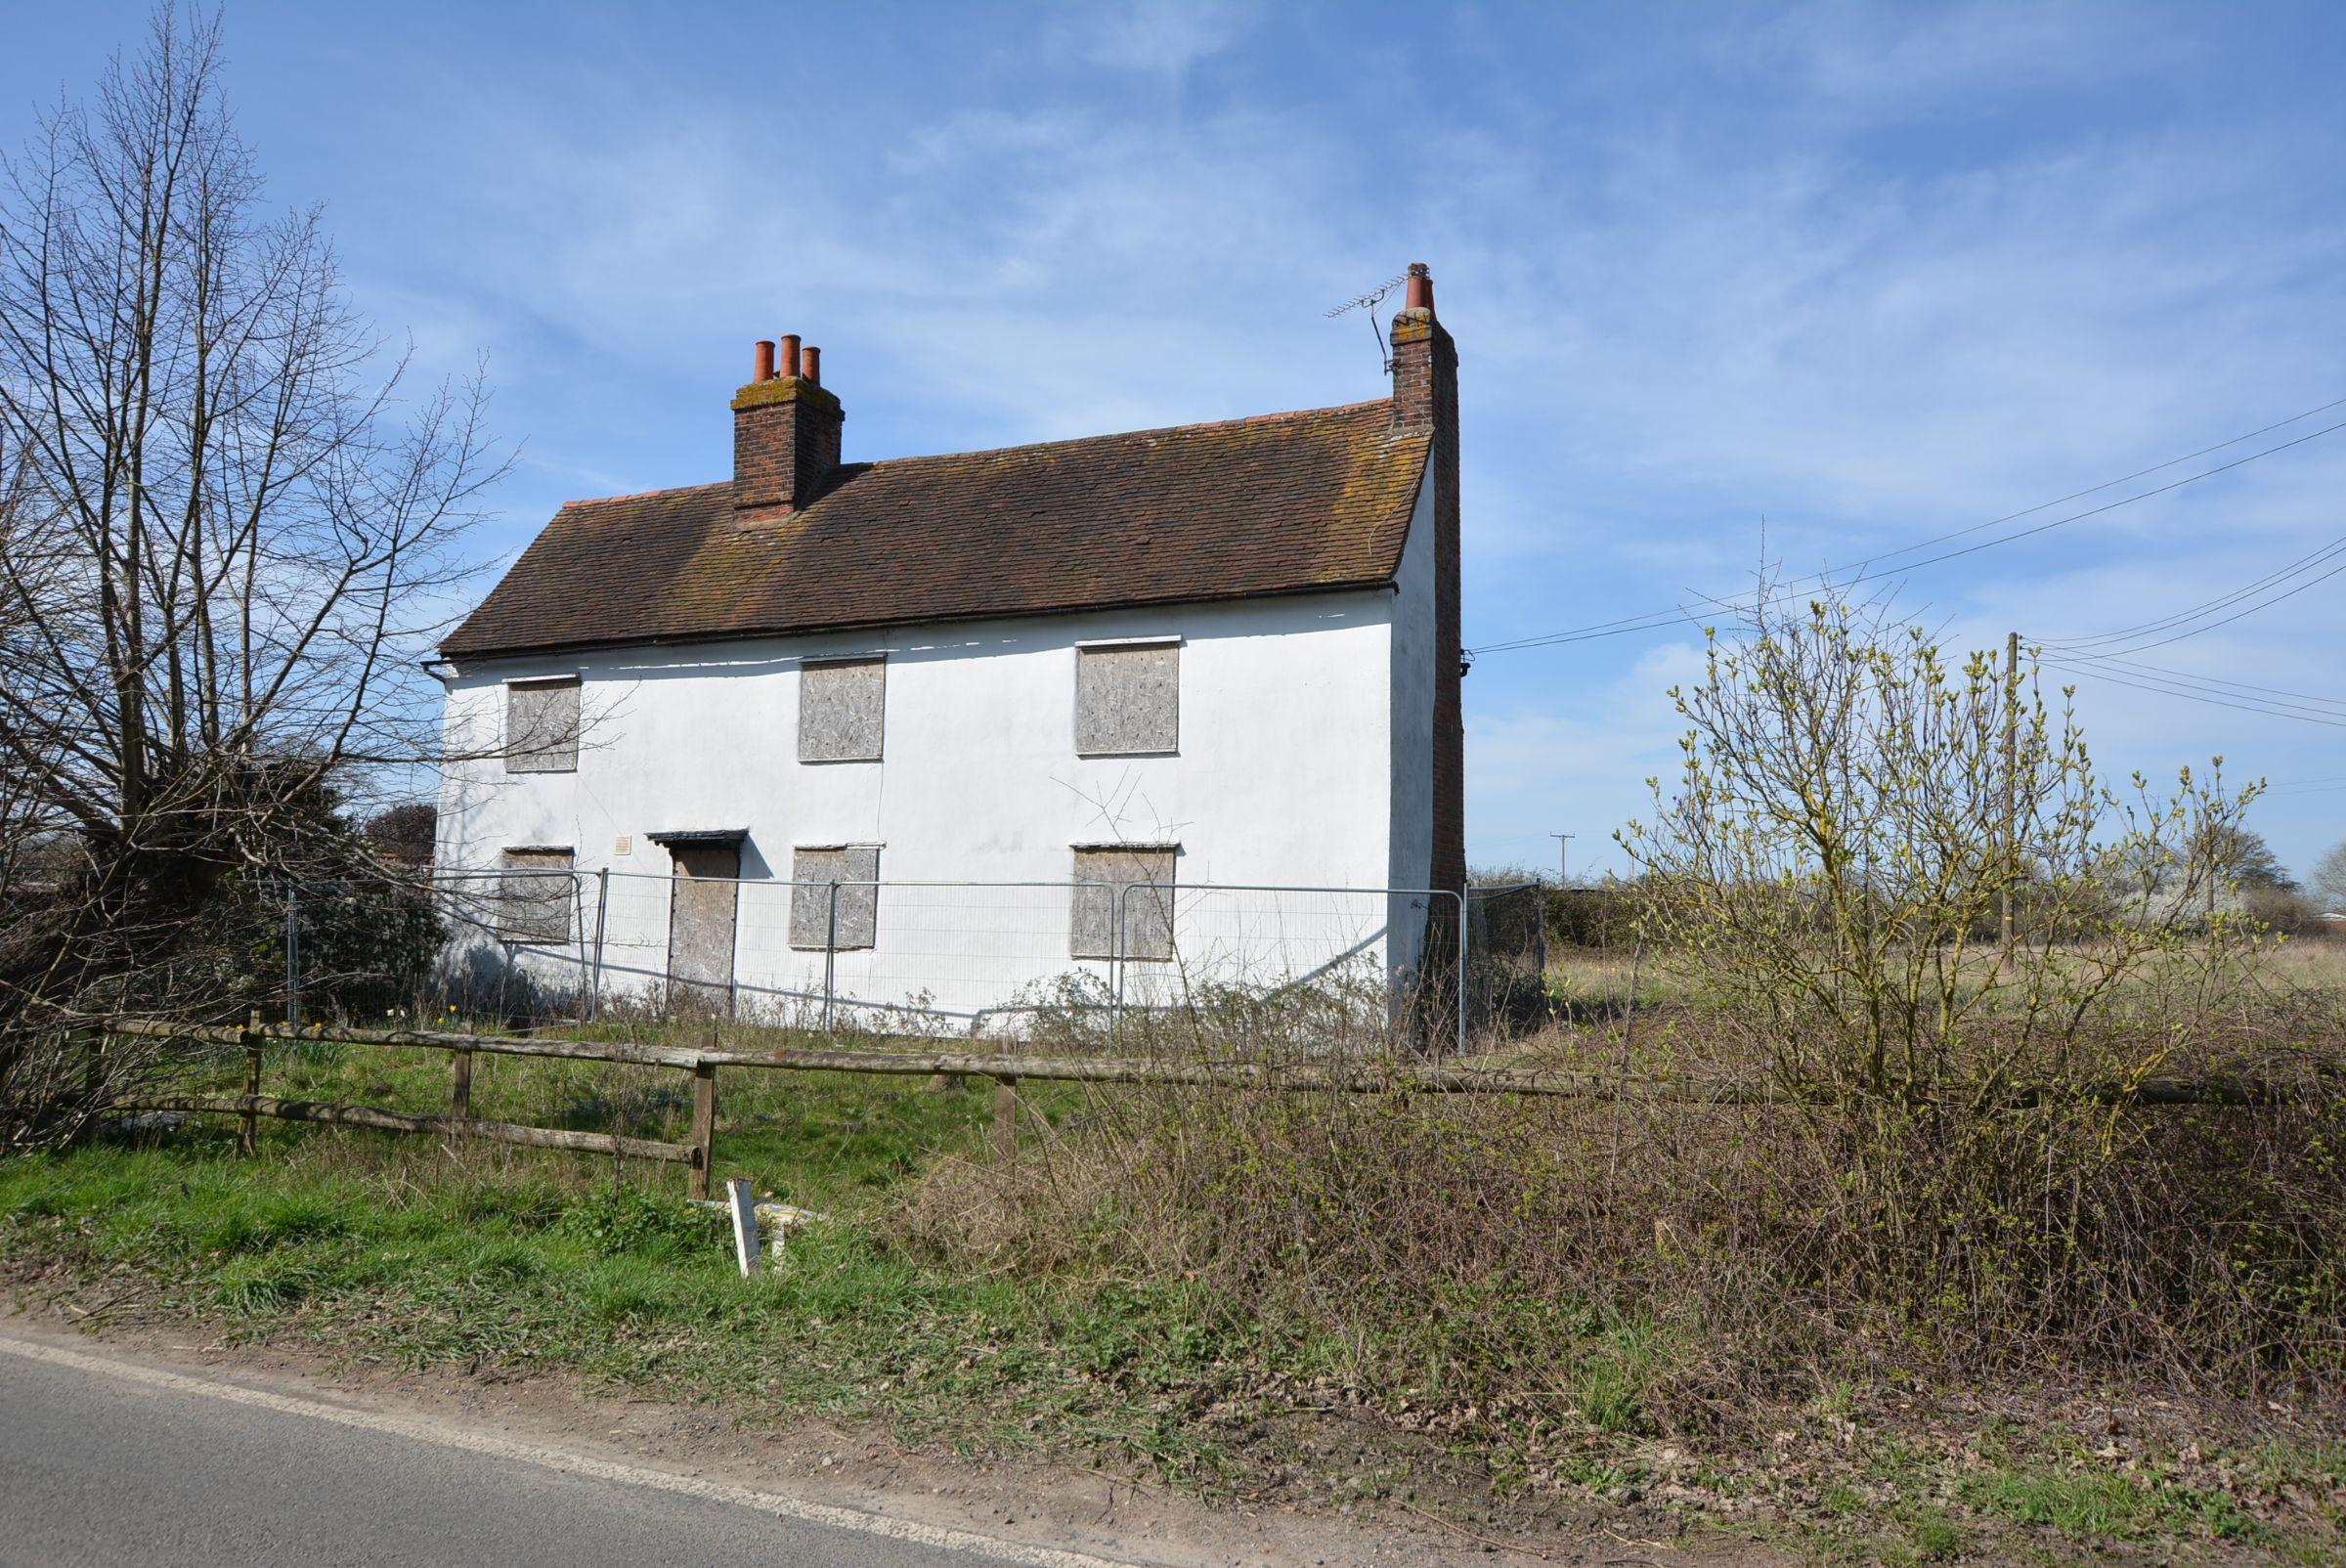 Quince Hall, Chelmsford Road, Blackmore, Ingatestone